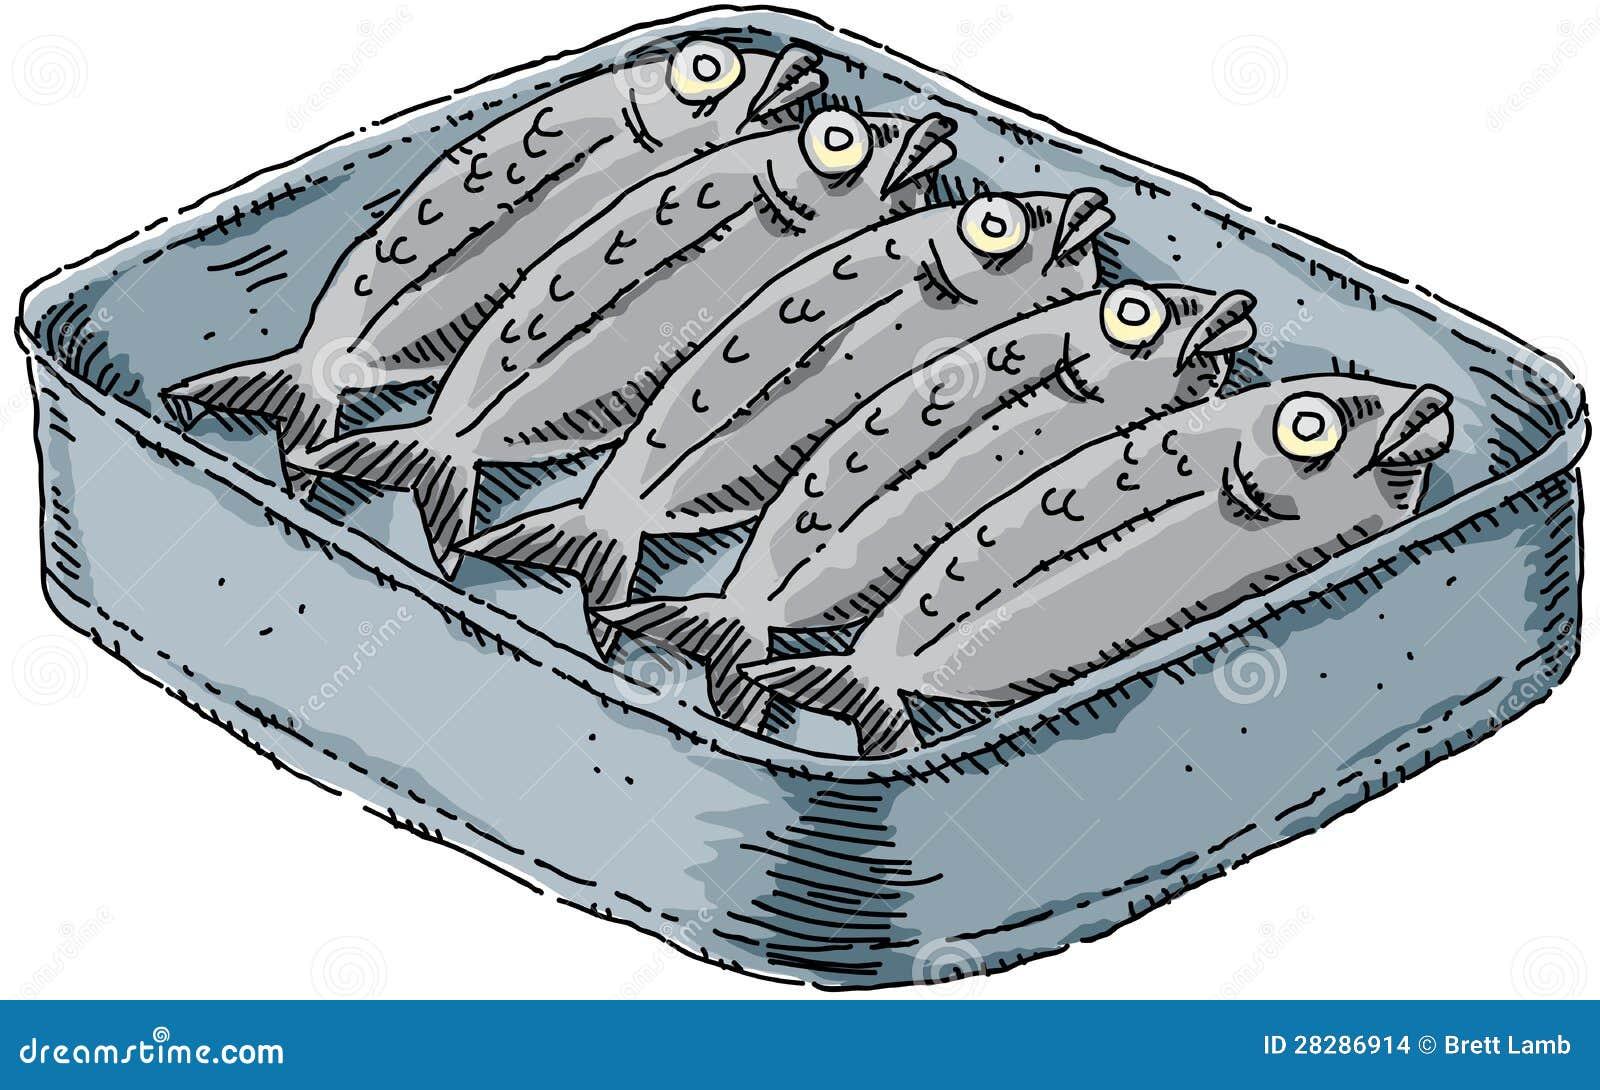 Cartoon Sardines Stock Images - Image: 28286914